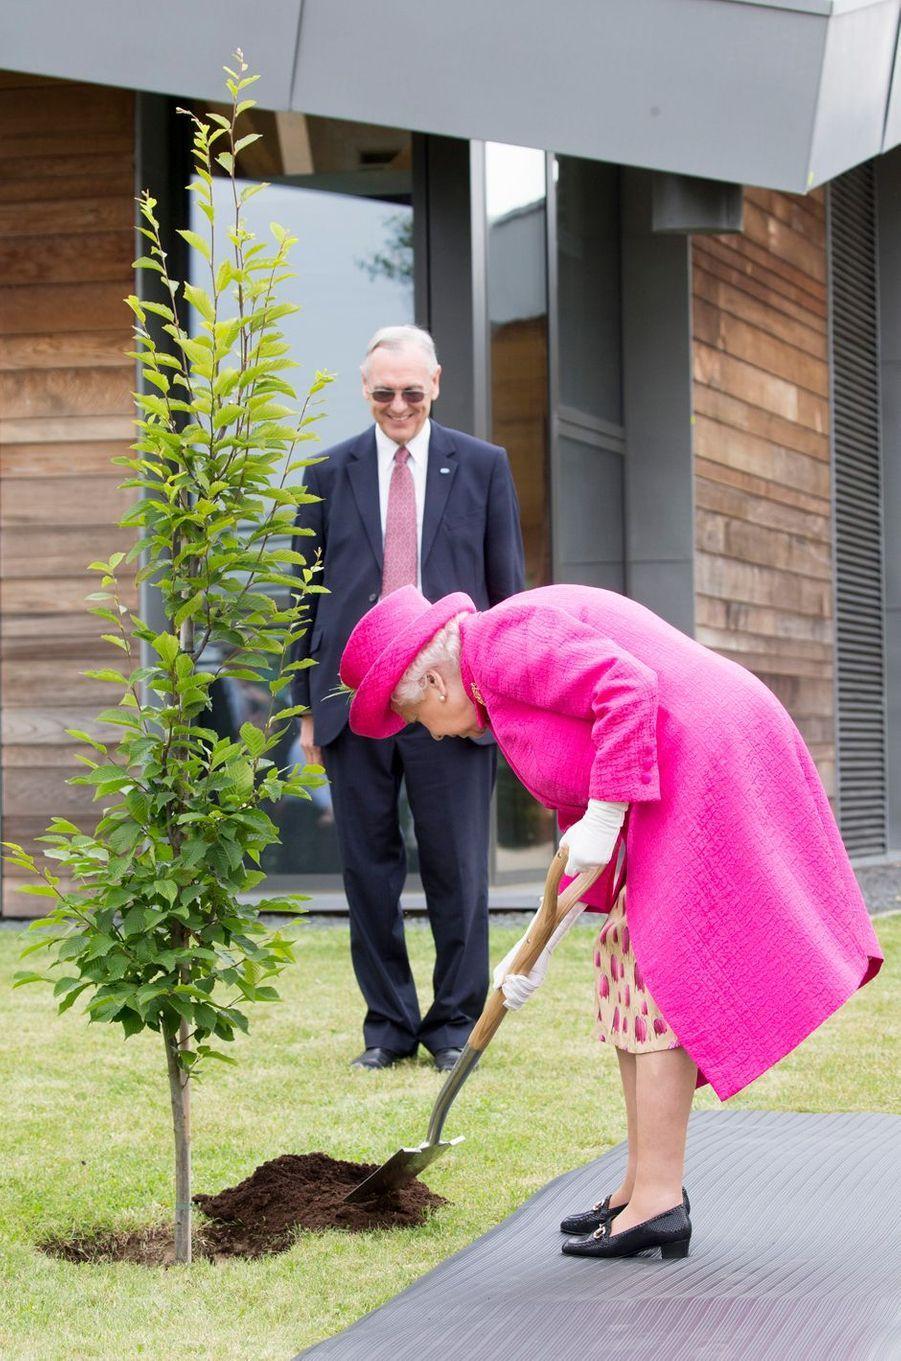 La reine Elizabeth II plante un arbre à Cambridge, le 9 juillet 2019